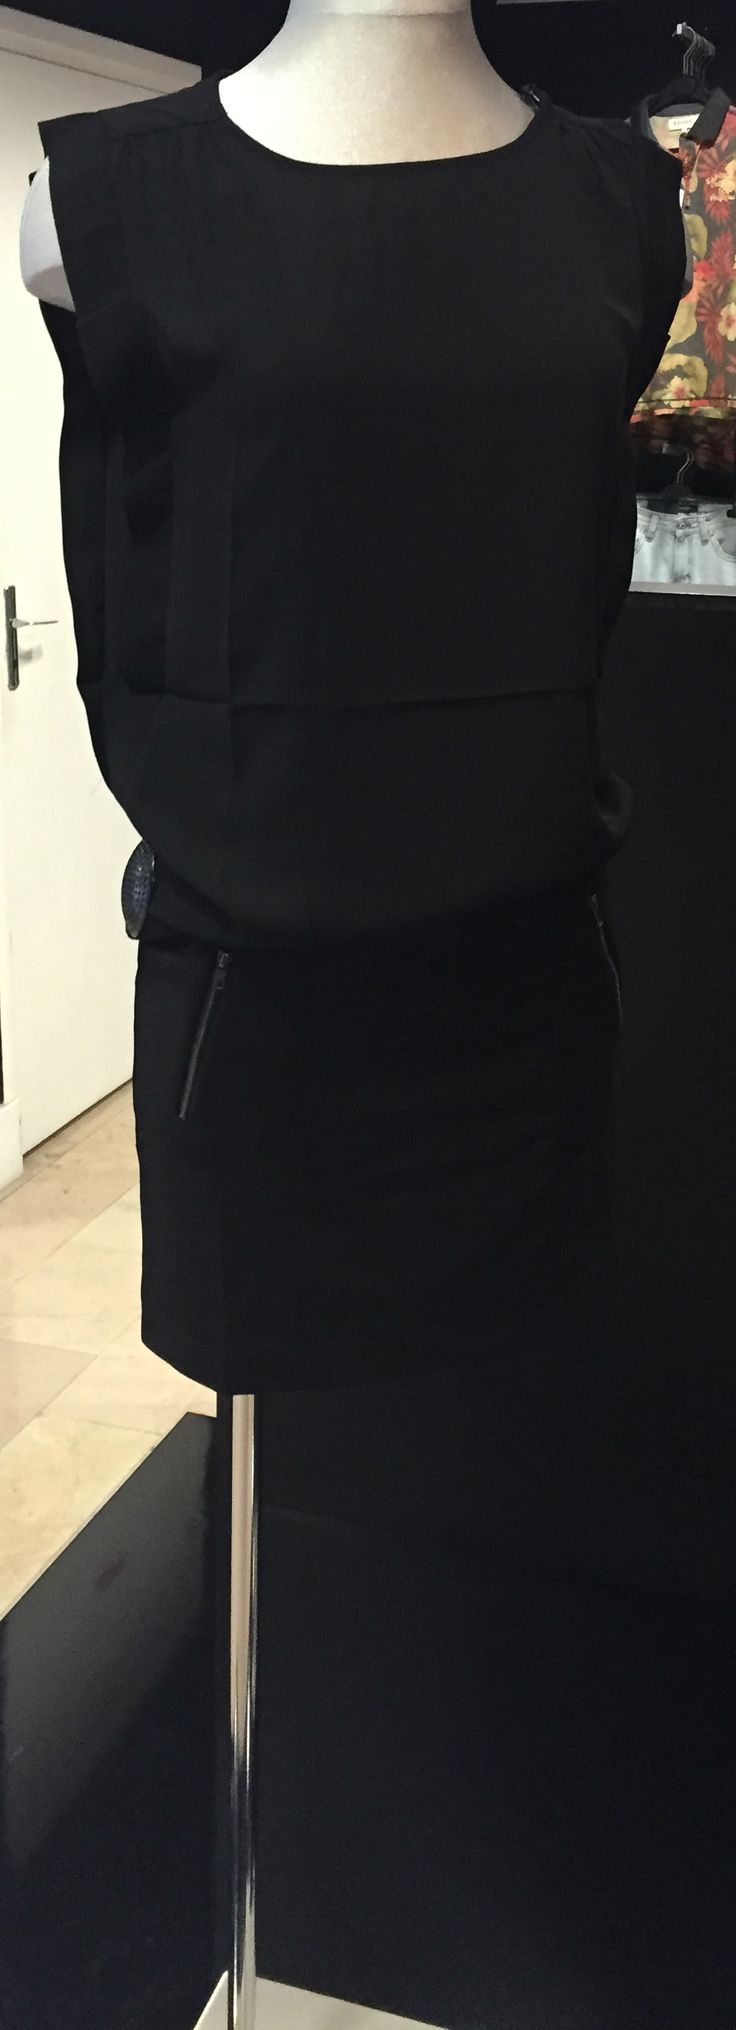 Sexy, Glamour et Elegante dans votre petite robe noir de la marque Teddy Smith. RDV chez PARANO